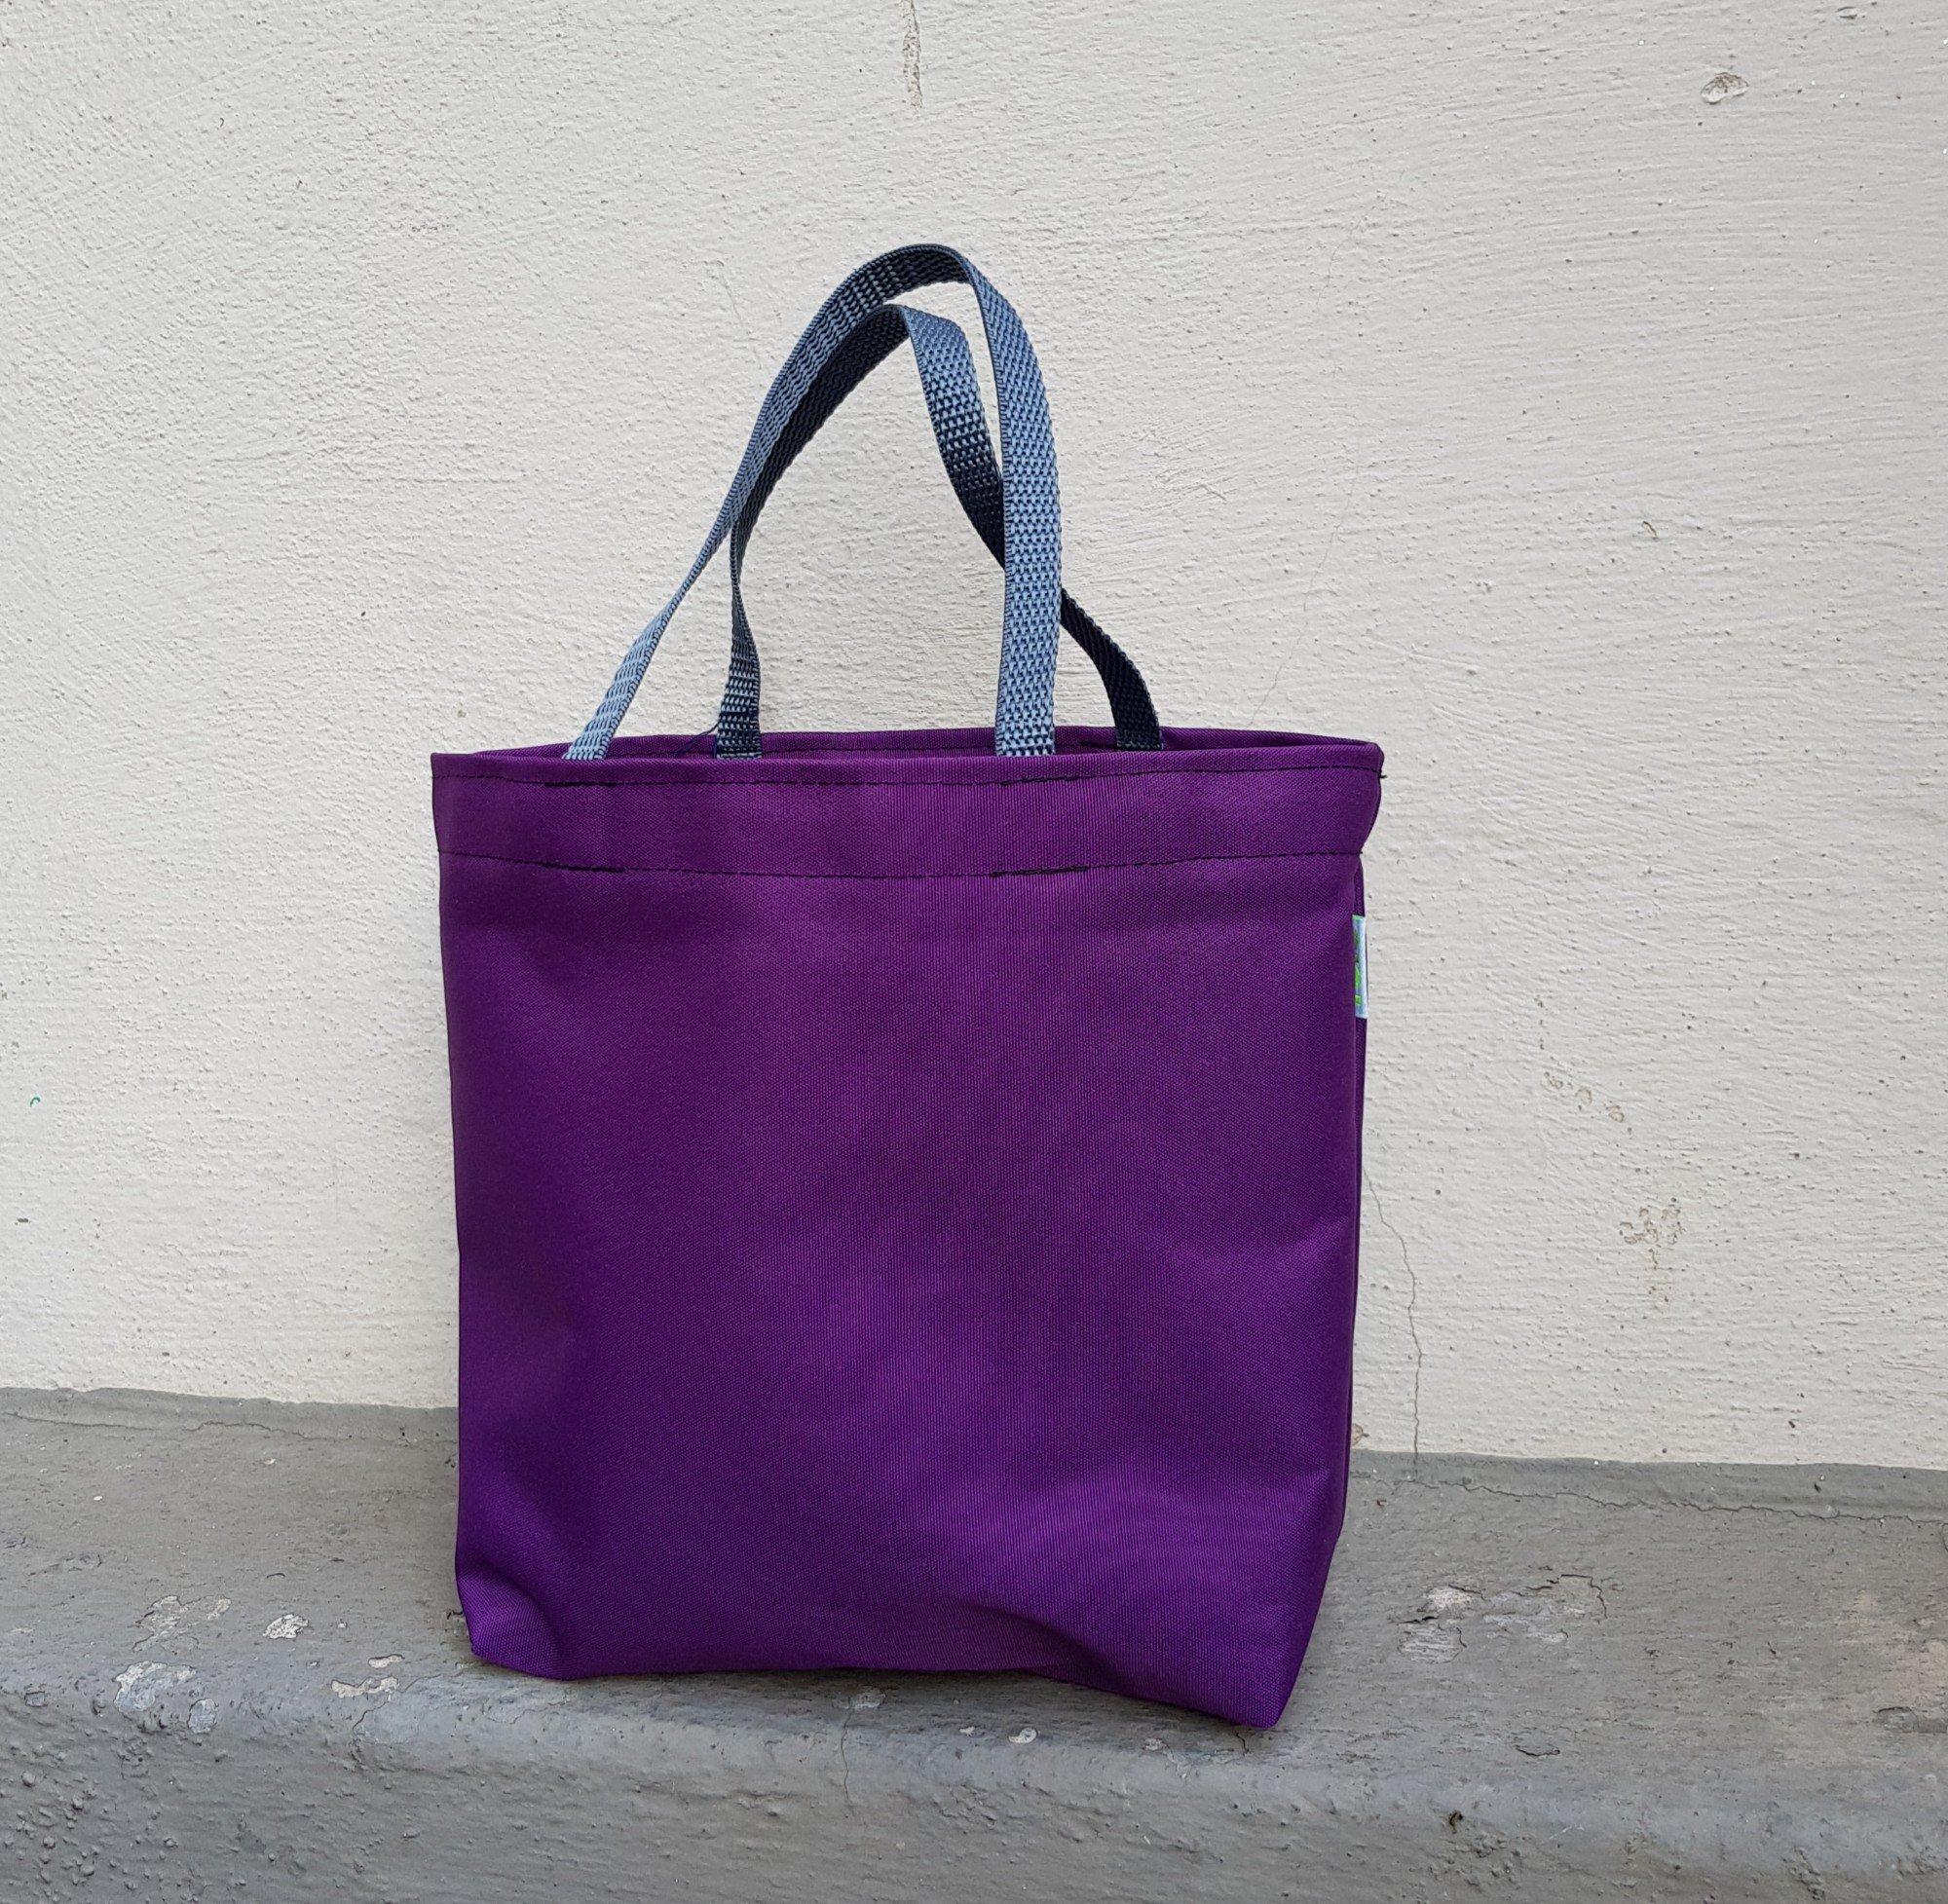 Matlådeväska/Lunch Bag - (Mindre) Lila